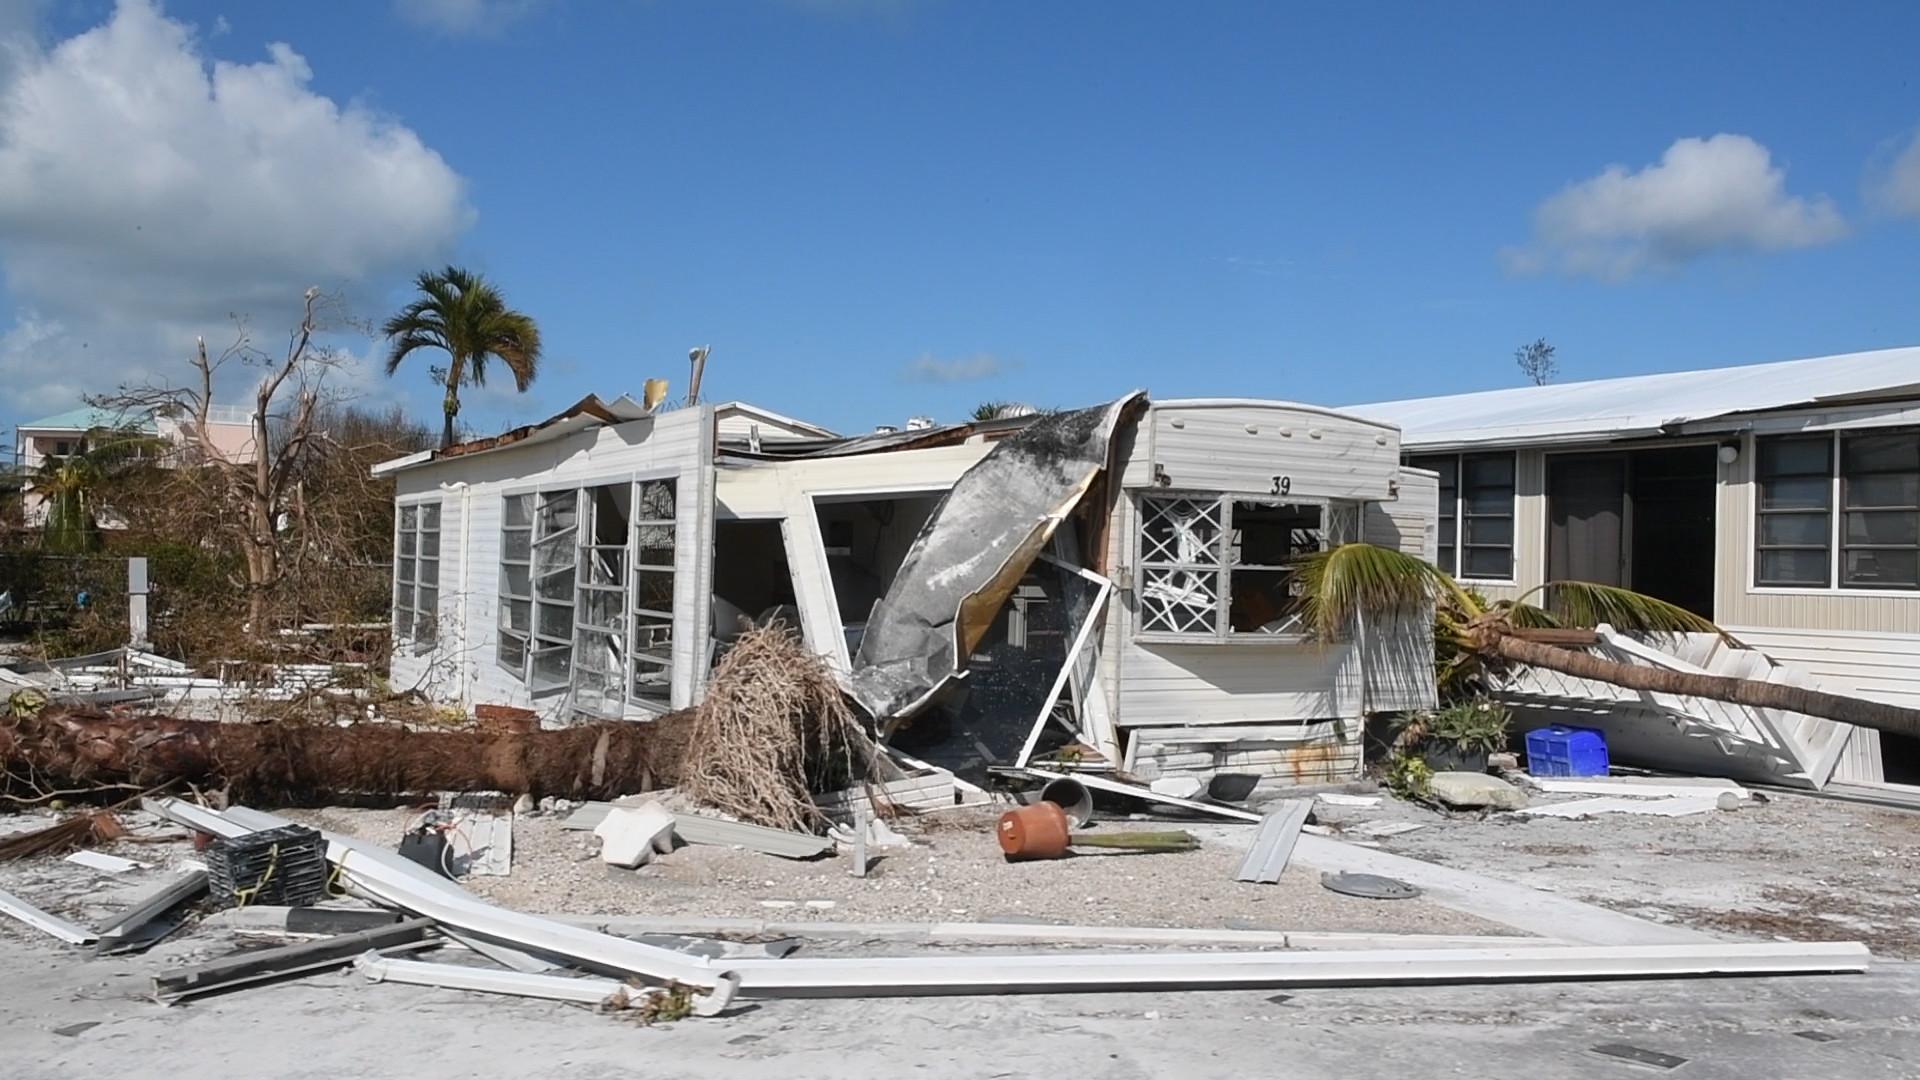 Hurricane Irma Florida Keys Man Who Rode Out Storm Says It Sounded Like Death South Florida Sun Sentinel South Florida Sun Sentinel